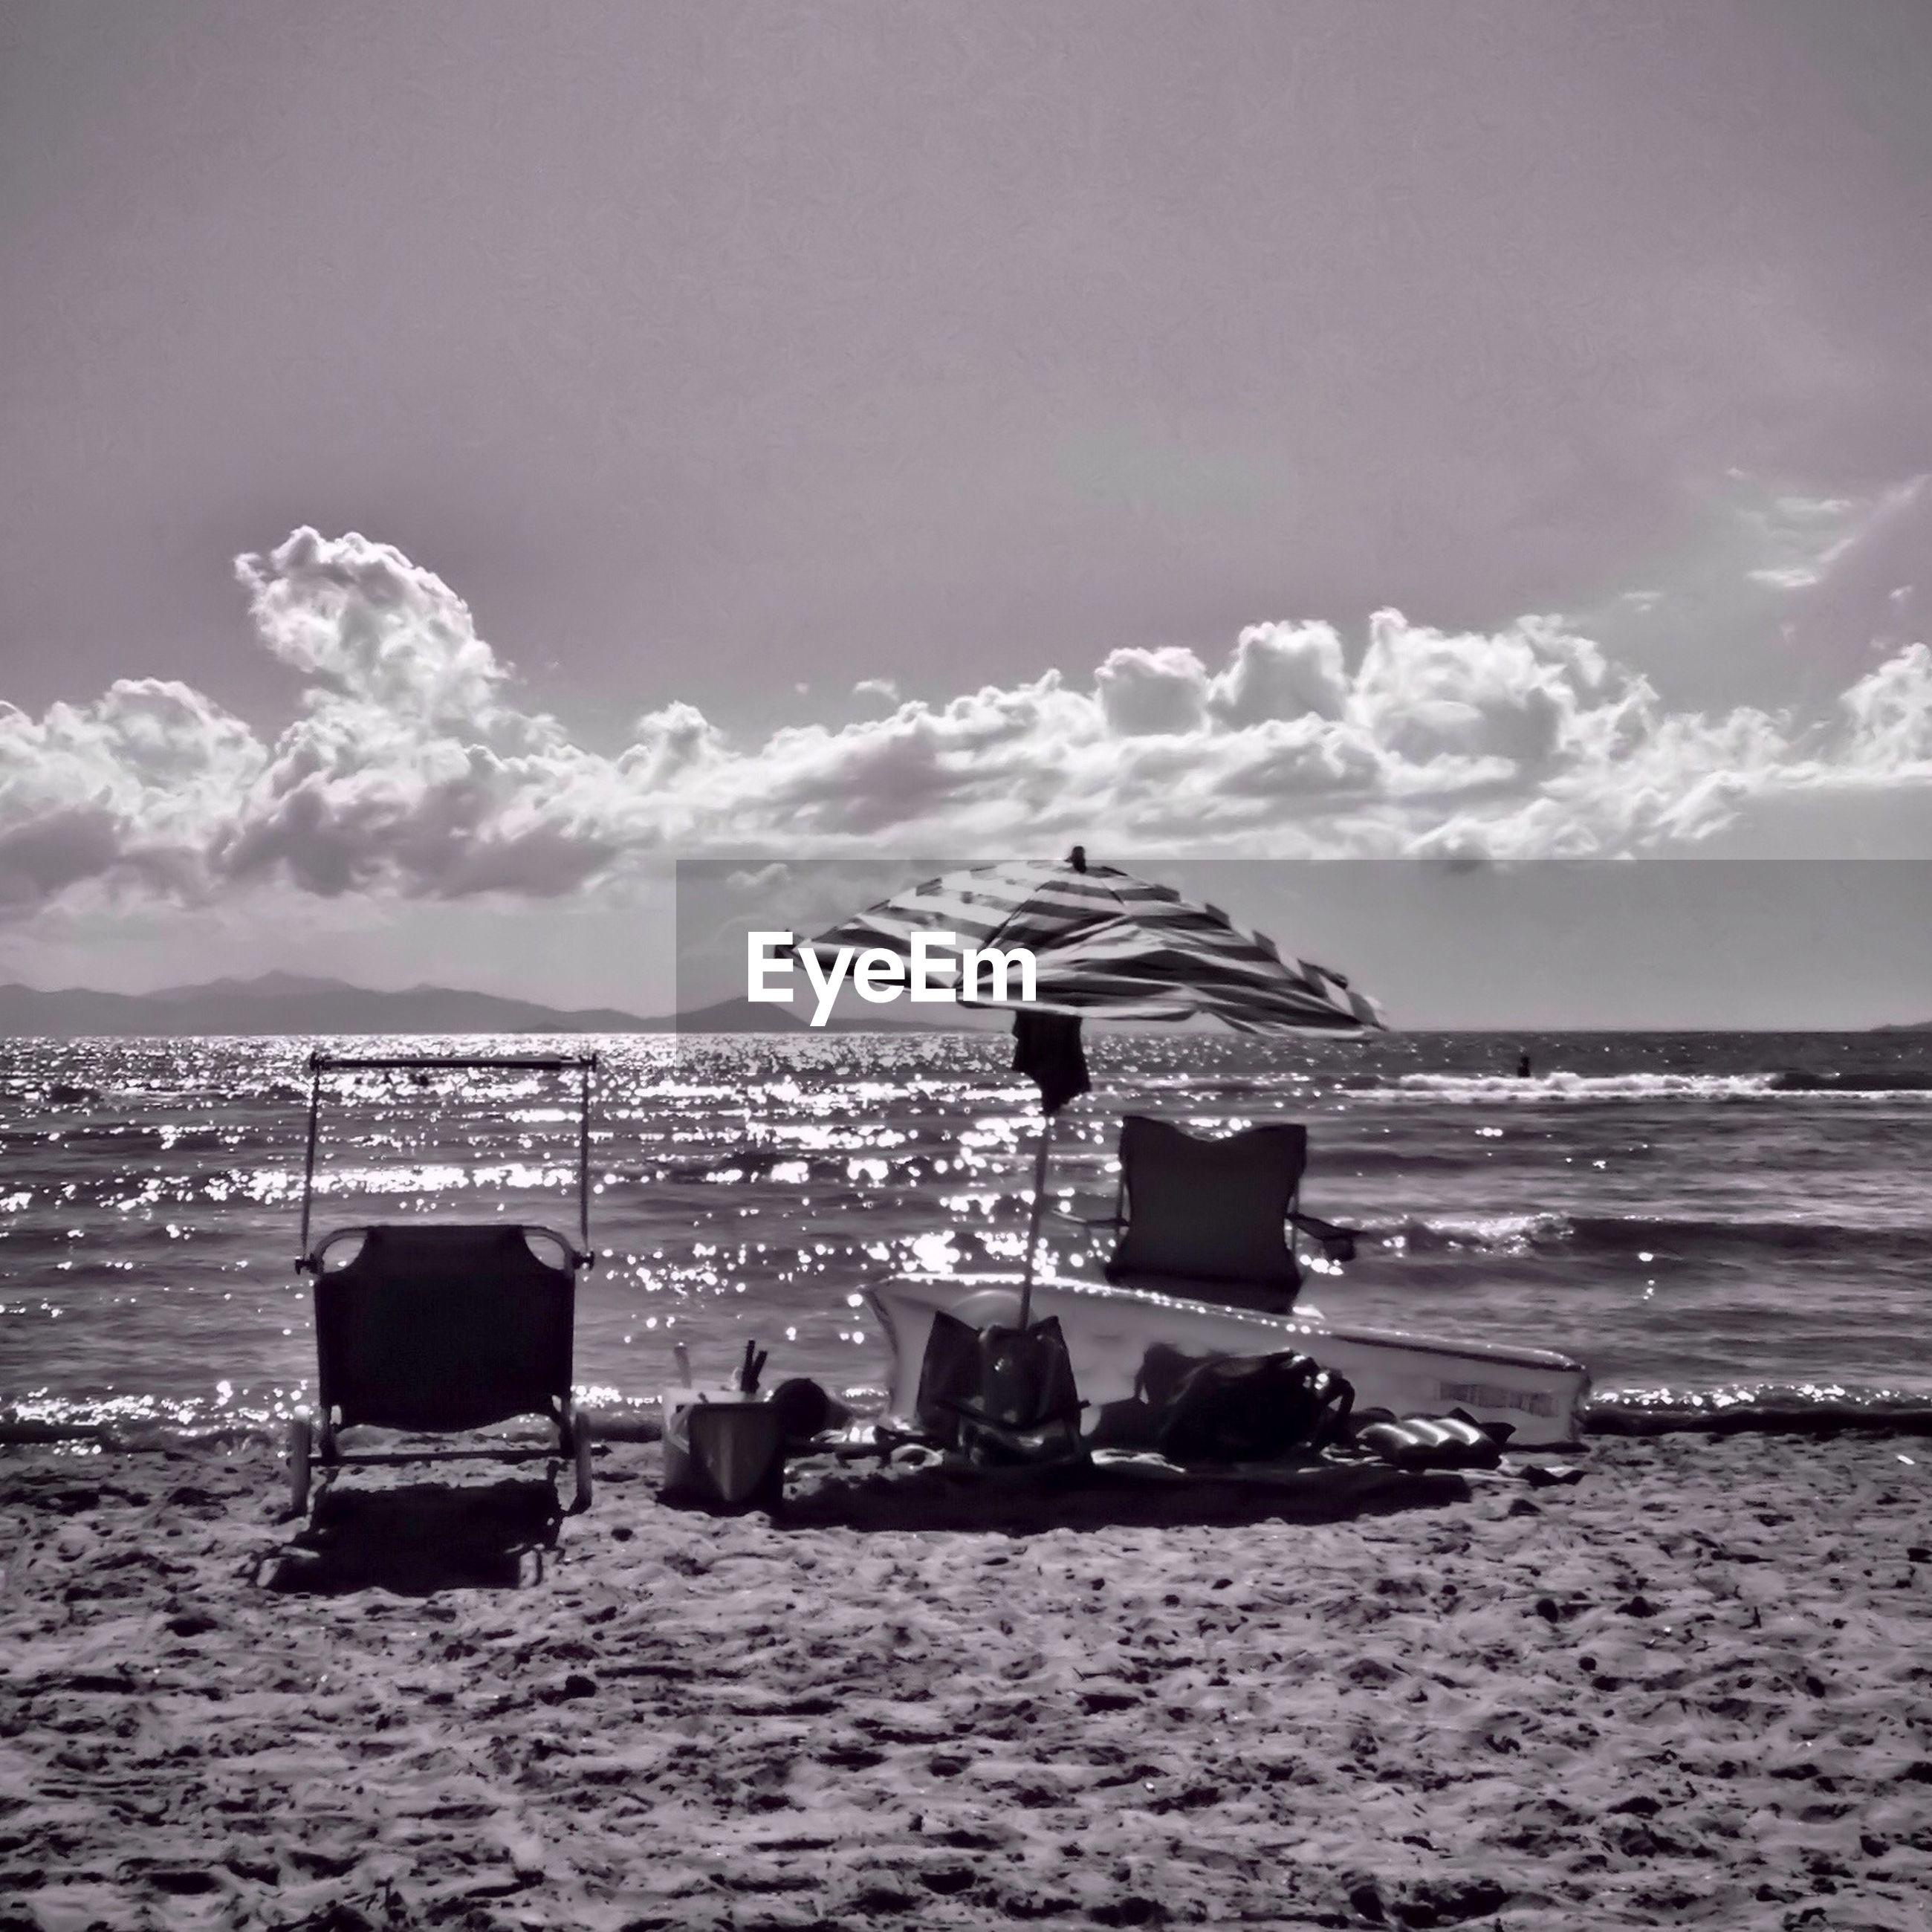 Chair and parasol on beach against sky